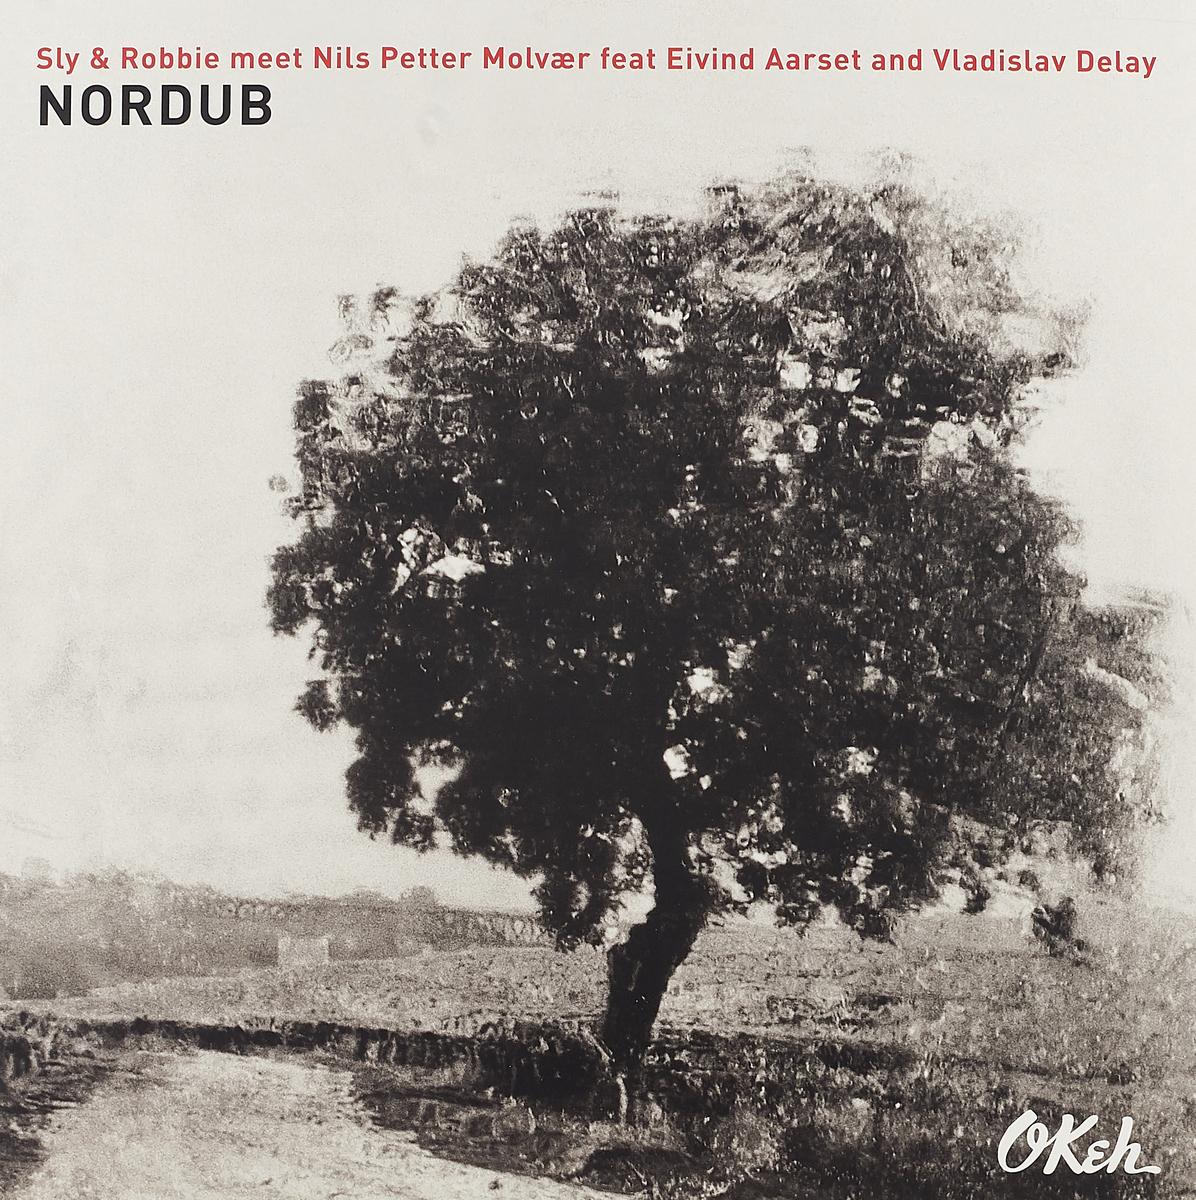 Sly & Robbie Sly & Robbie Meets Nils Petter Molvar Feat Eivind Aarset And Vladislav Delay. Nordub (2 LP)